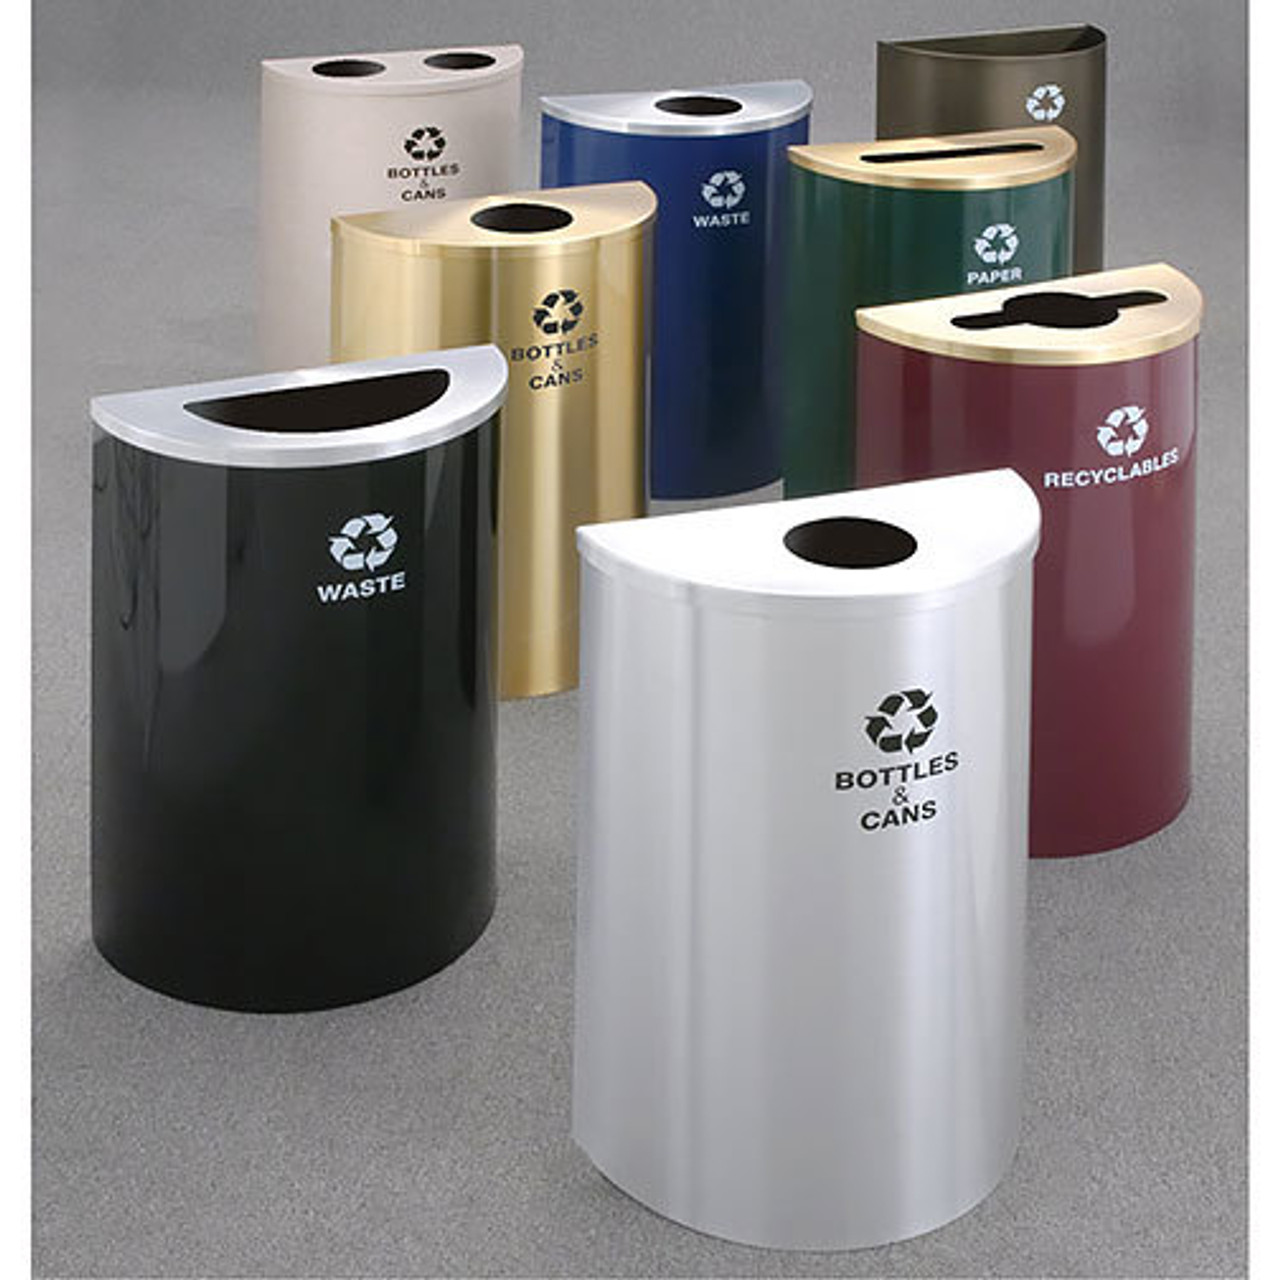 Glaro RecyclePro Profile Recycling Bins